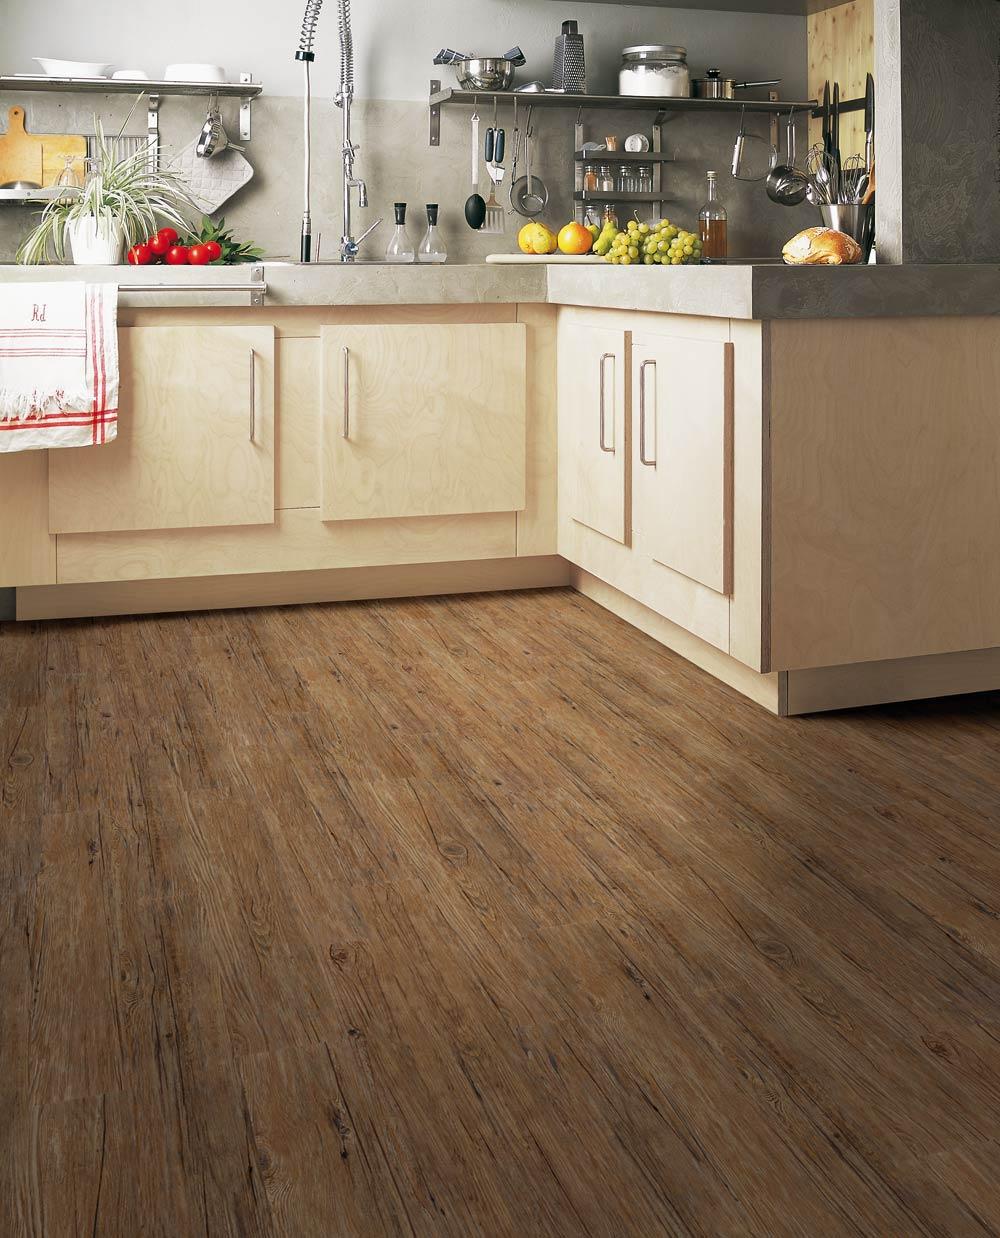 Voorkeur PVC vloer laten leggen | Klik- en plakvloer in Noord-Nederland LH99